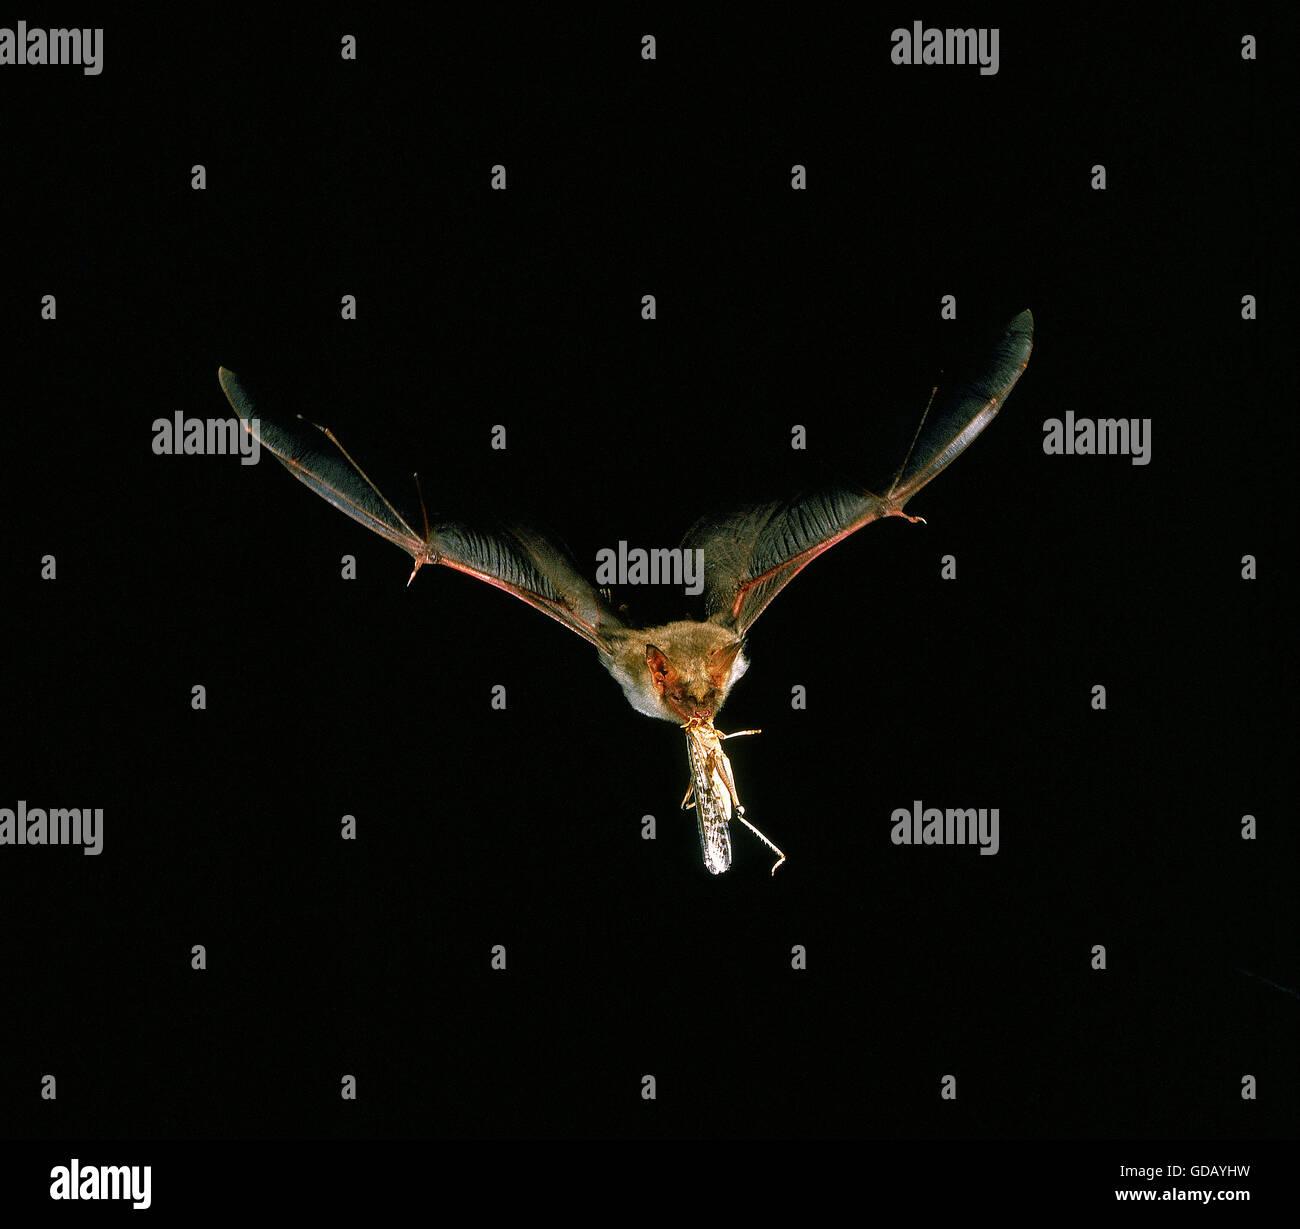 Maus-Eared Hieb, Myotis Myotis, Erwachsenen im Flug fangen Grasshopper Stockbild